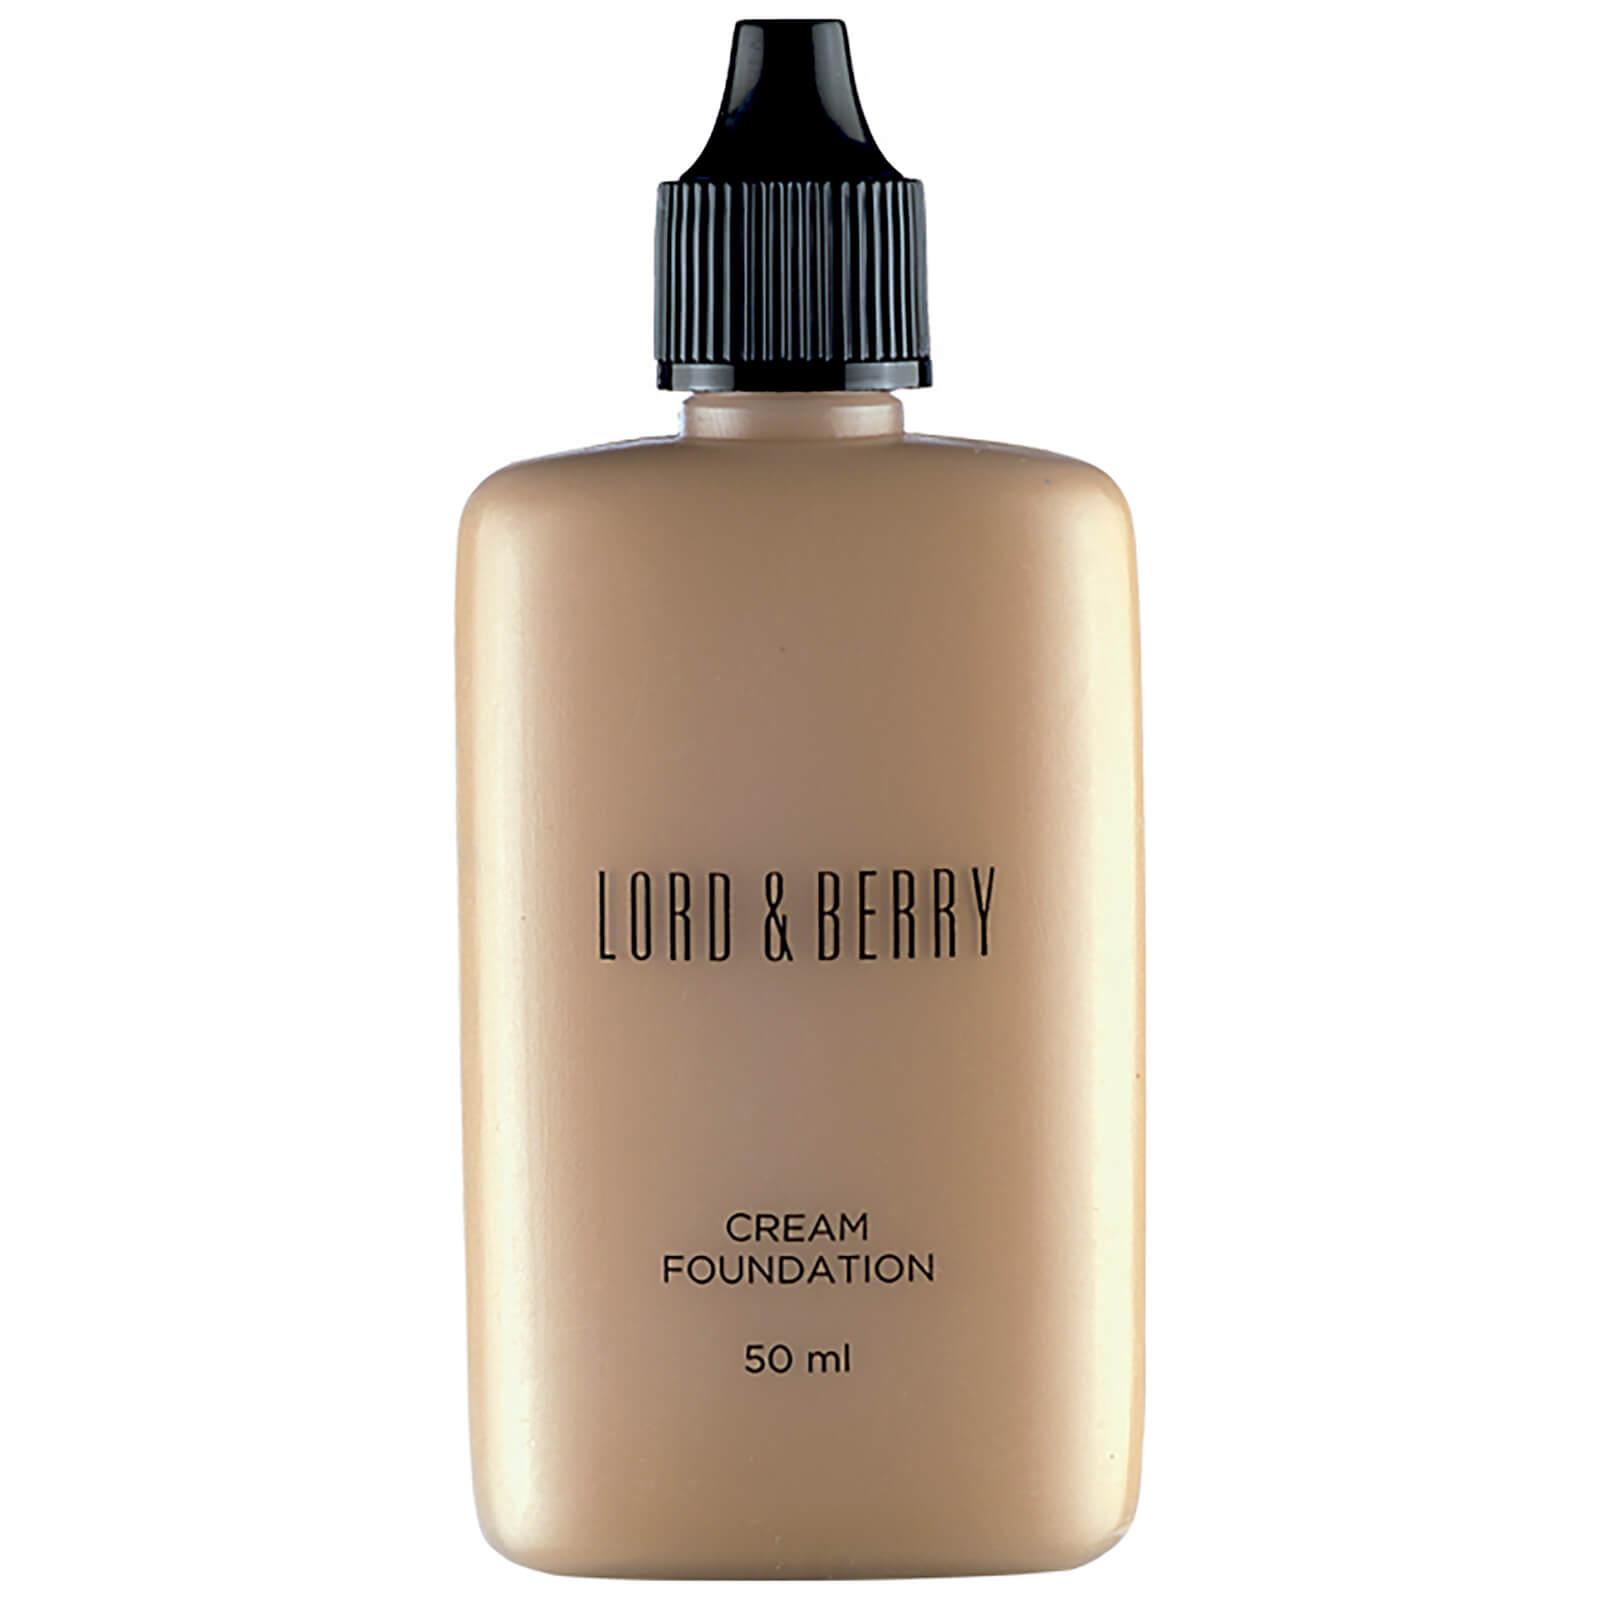 Lord & Berry Cream Foundation - Honey